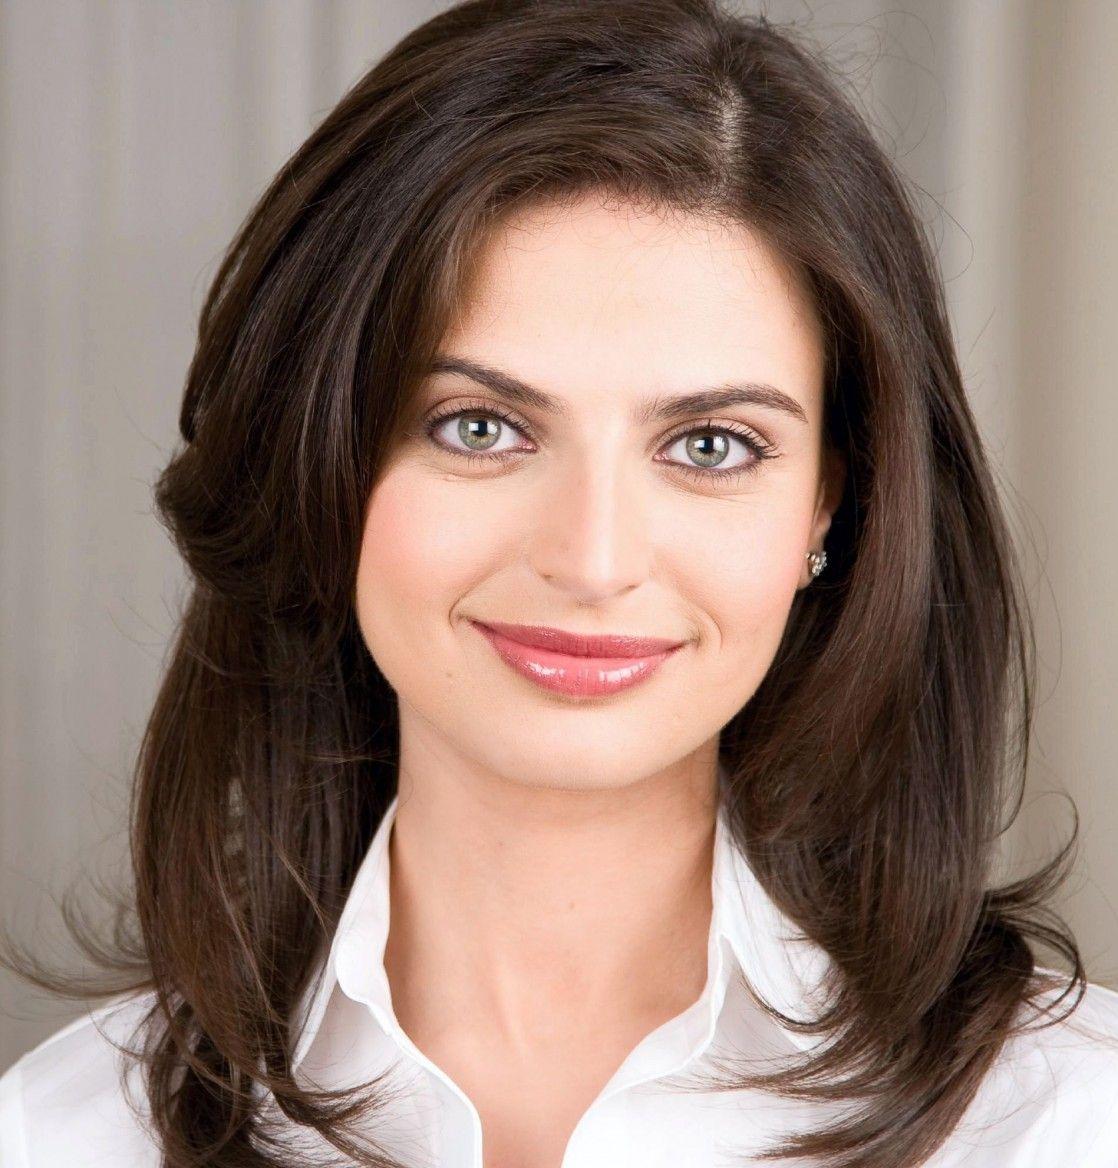 Bianna Golodryga of CNN News Good morning america